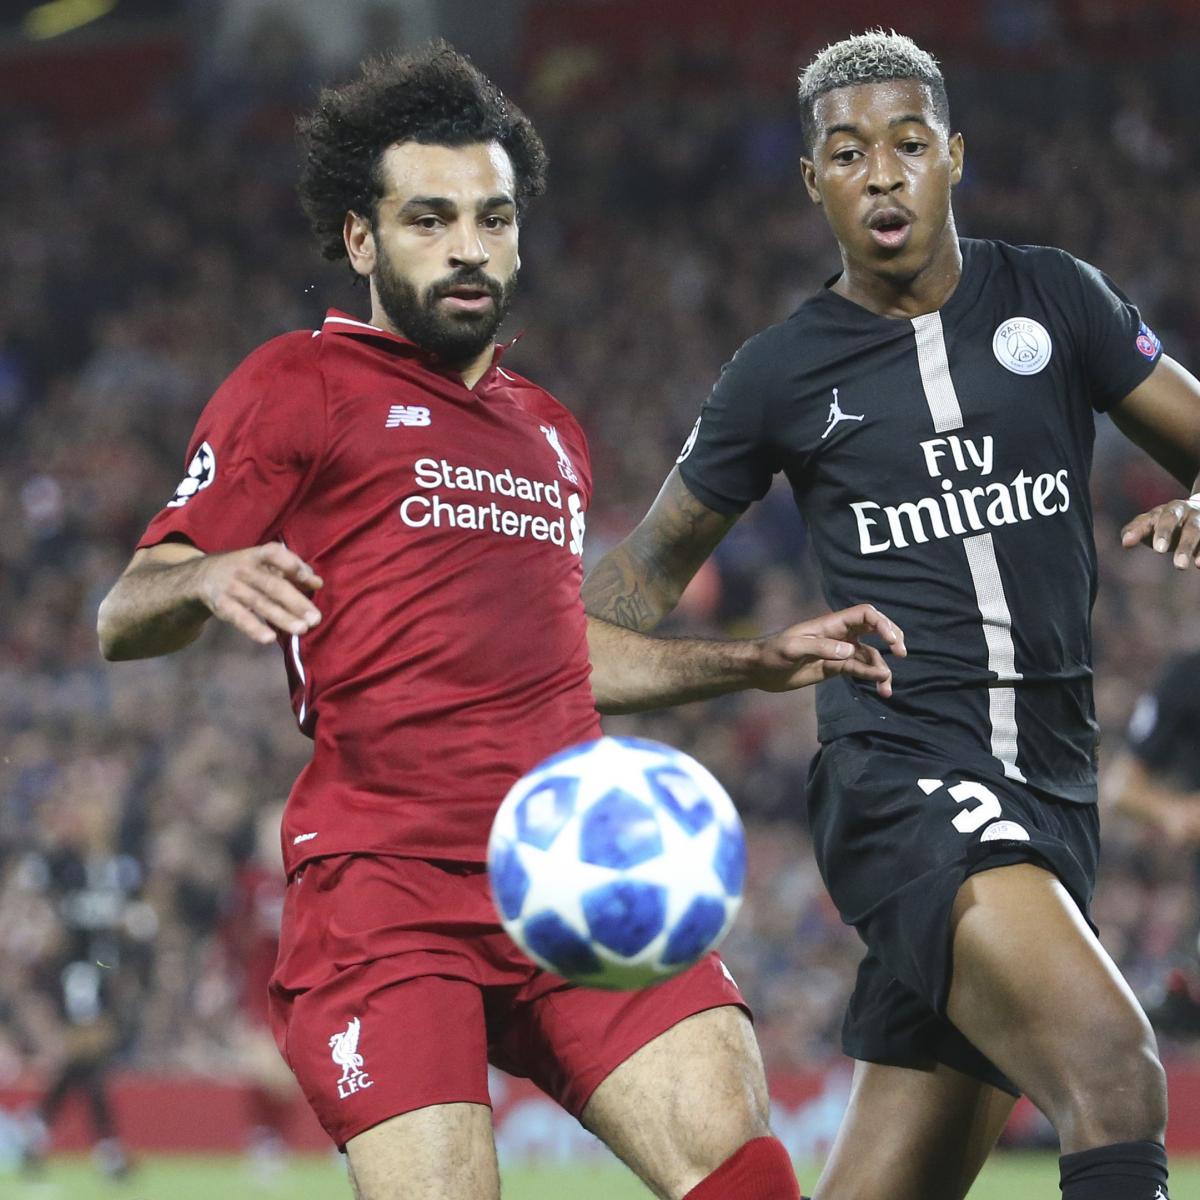 PSG Vs. Liverpool: Odds, Preview, Live Stream, TV Info For